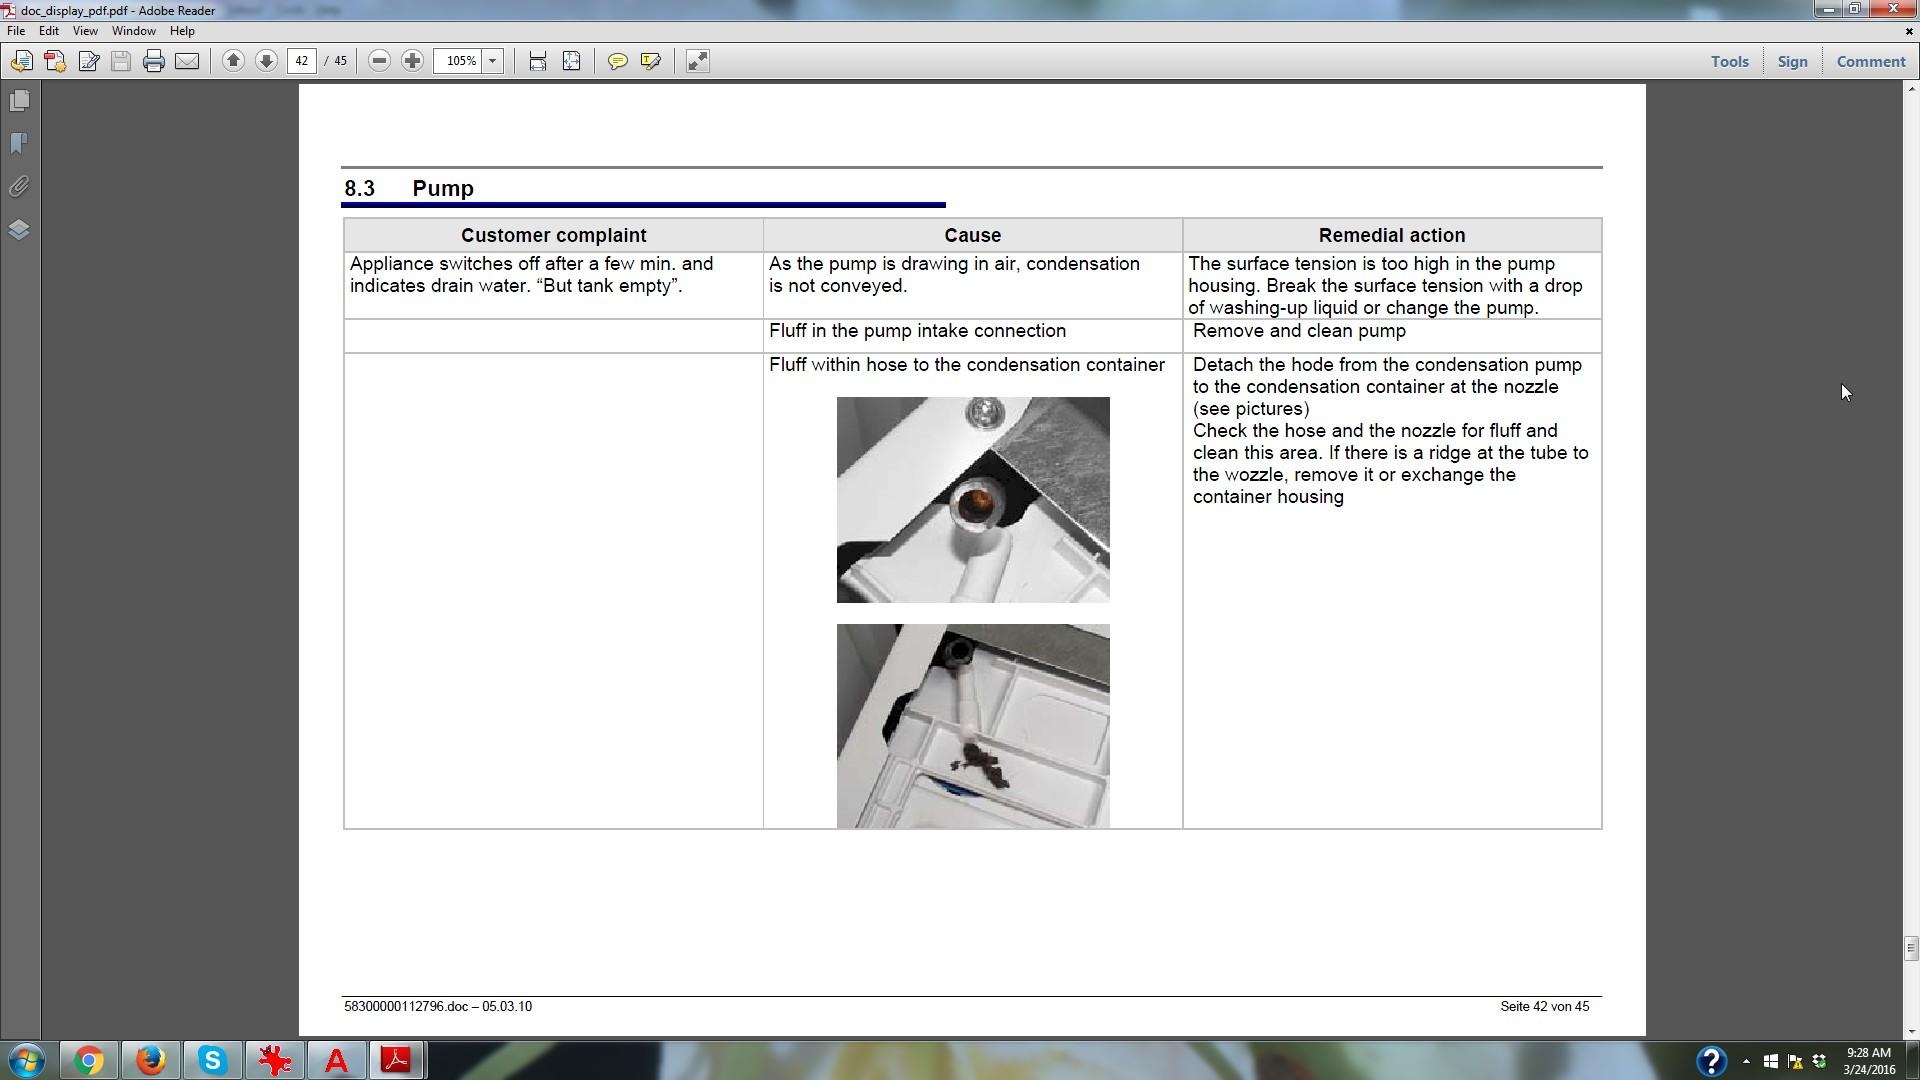 cdc16114-e3ae-4b63-91bc-ae16ca0ce227_ScreenHunter_2011 Mar. 24 09.28.jpg